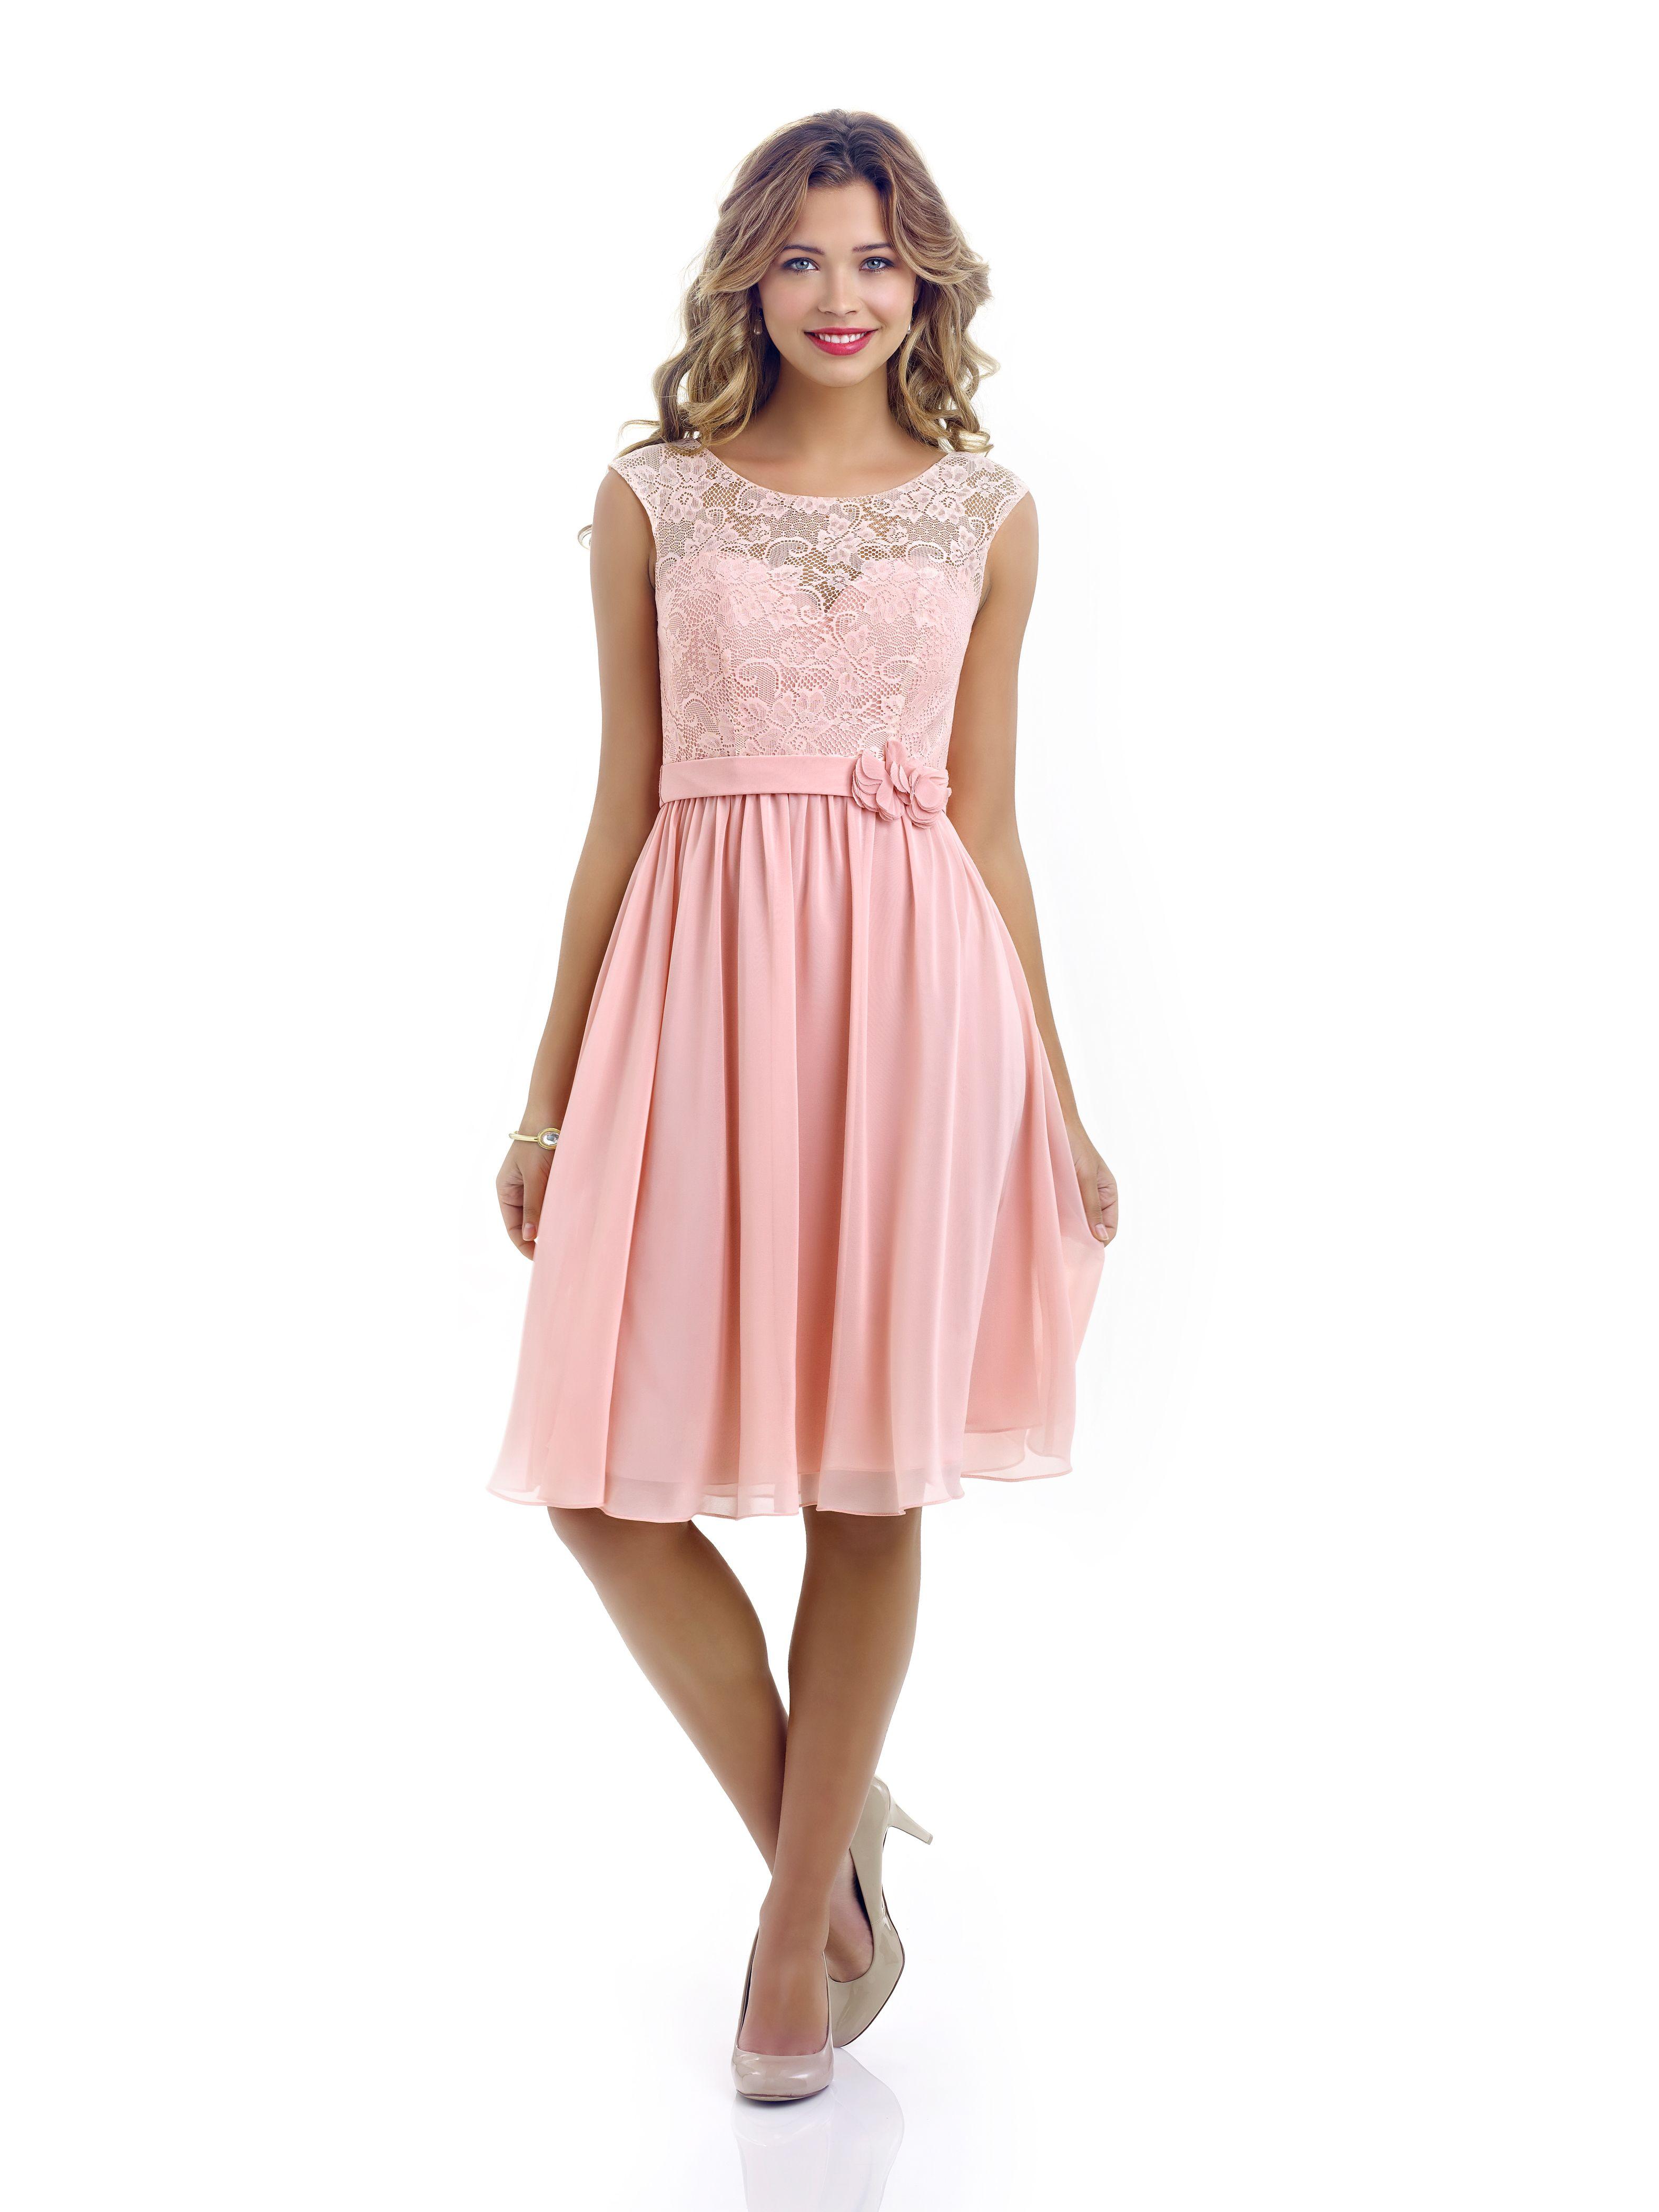 chiffon bridesmaid dress with lace bodice illusion neckline